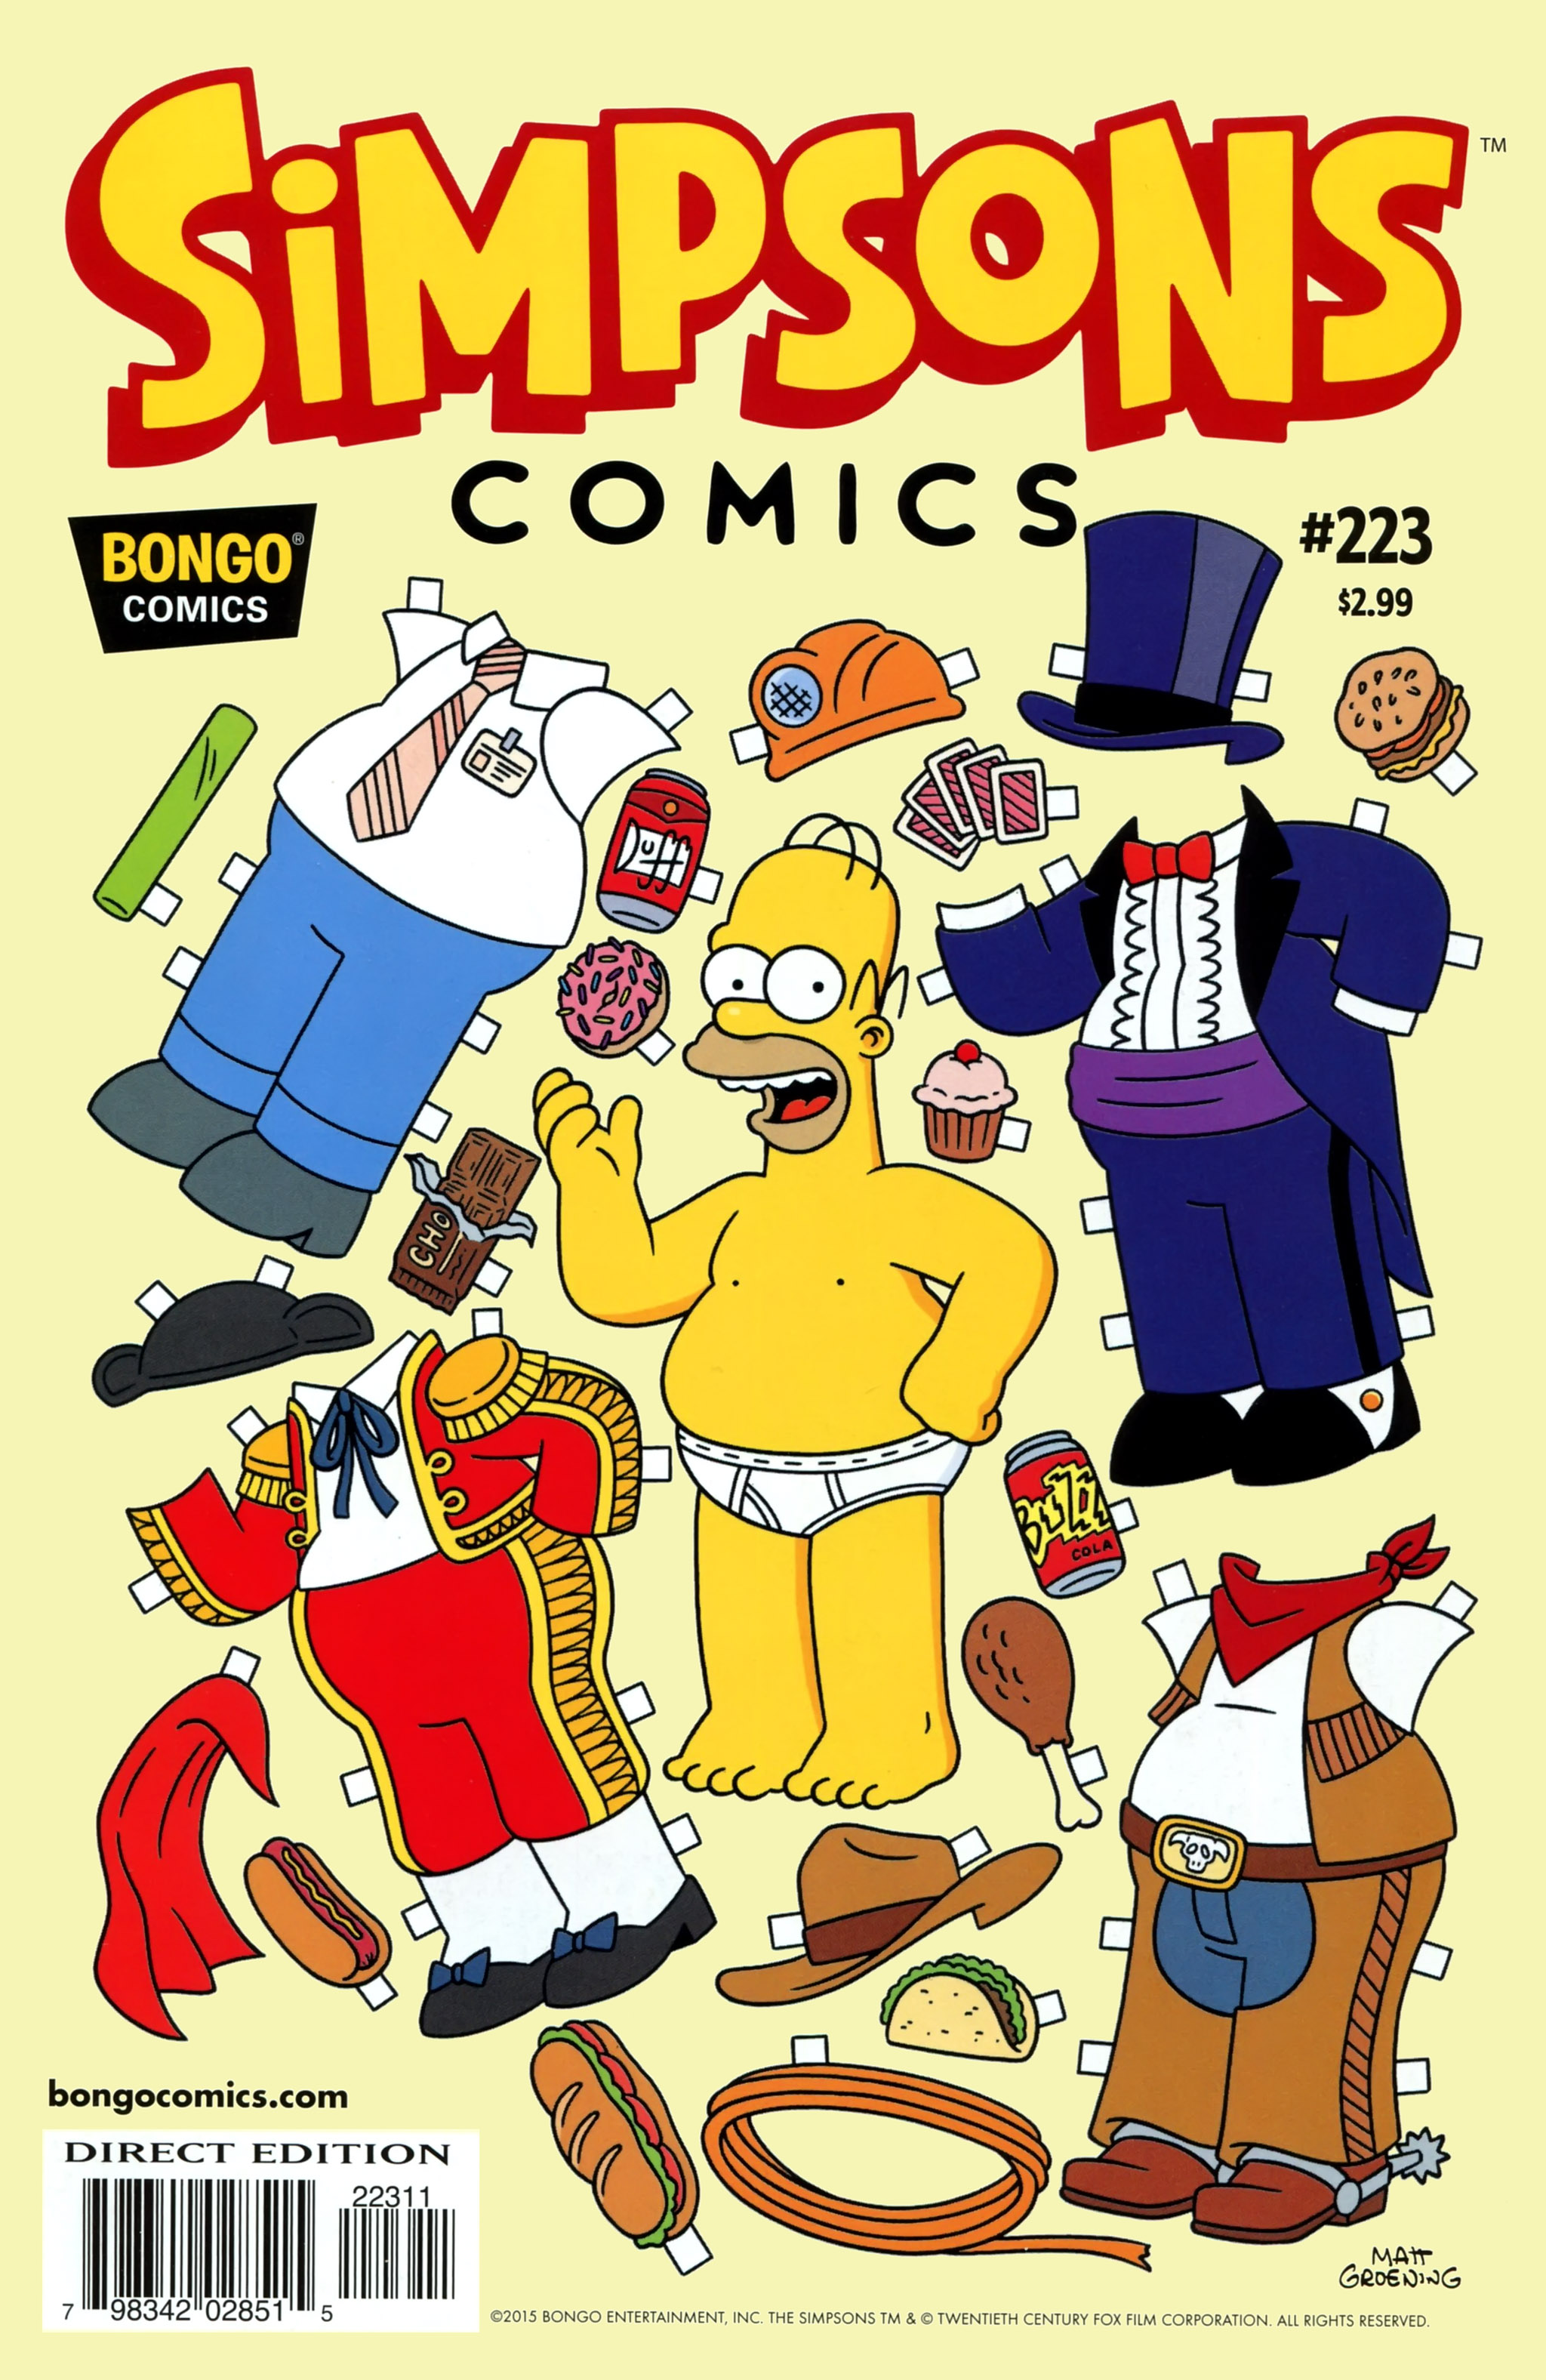 Simpsons Comics 223 Page 1